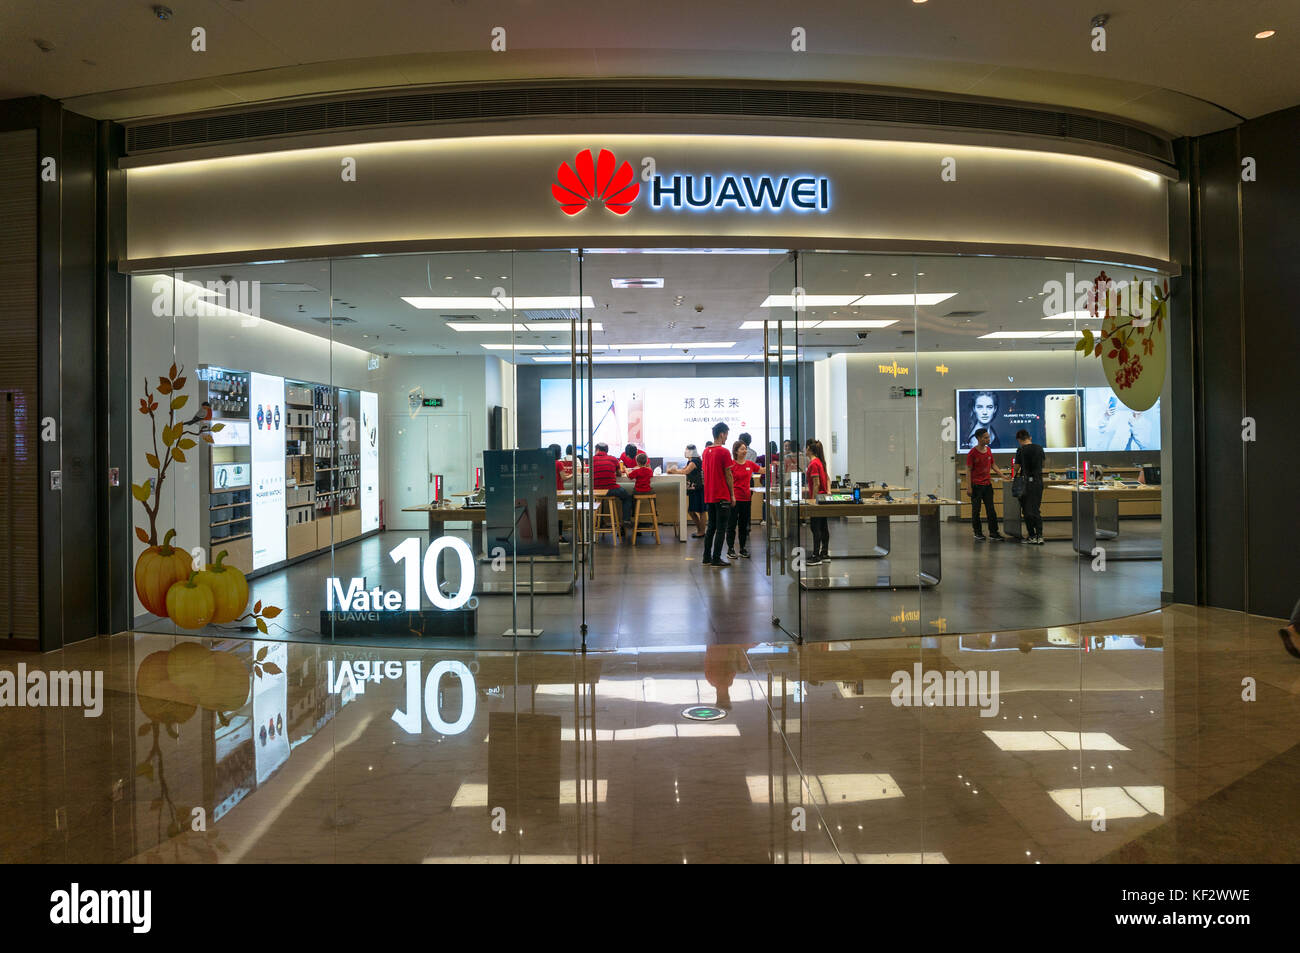 Huawei Stock Photos Amp Huawei Stock Images Alamy